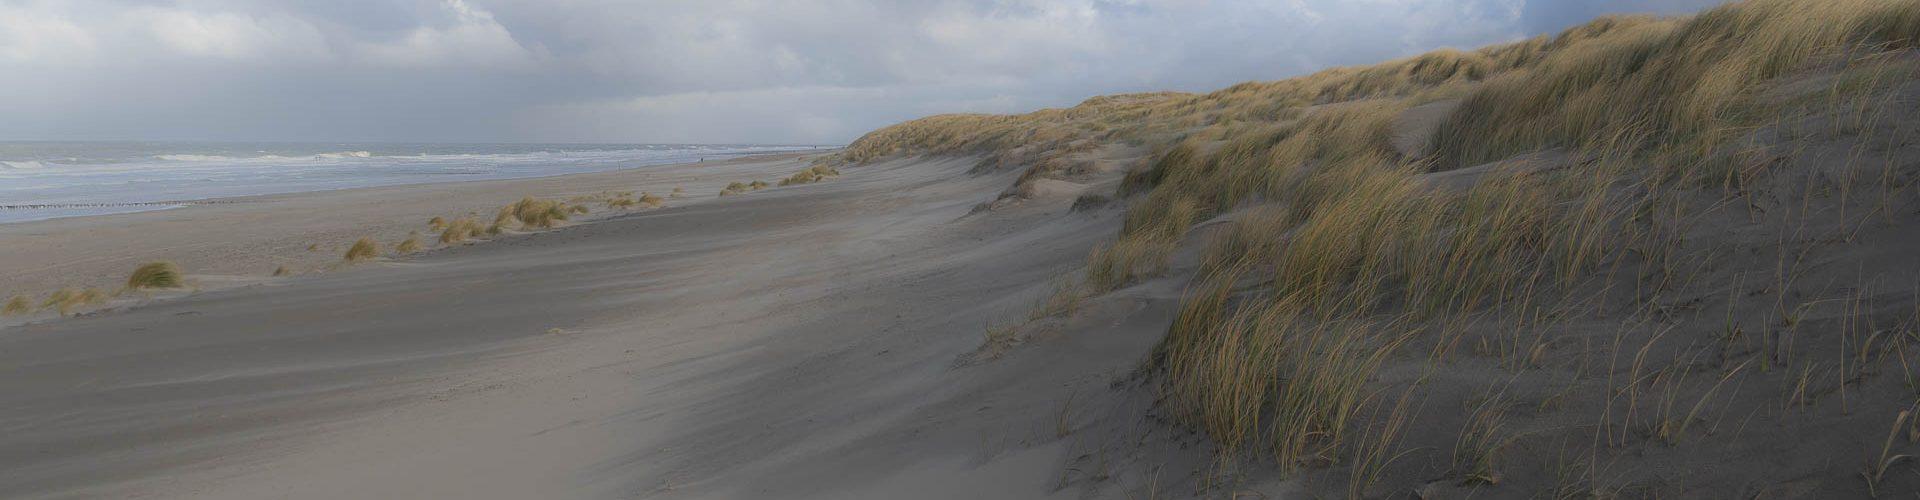 Westkapelle duinen